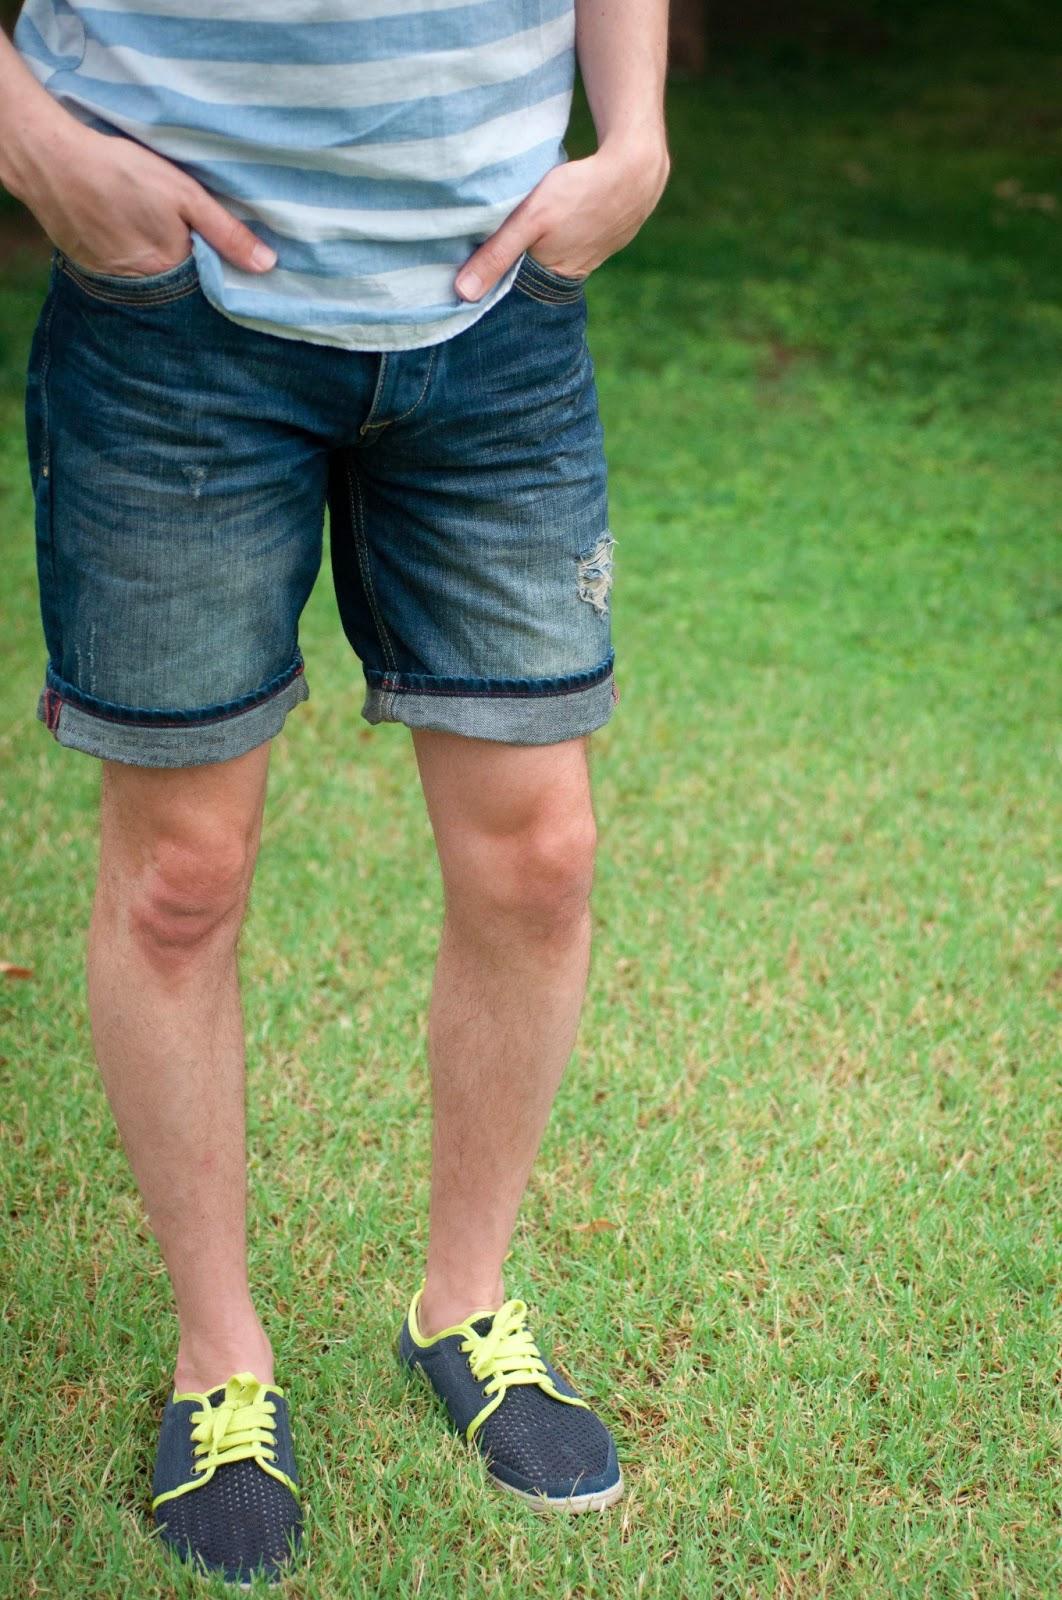 zara men, zara mens shorts, zara shoes, jcrew stripe shirt, jcrew ootd, mens style, mens fashion